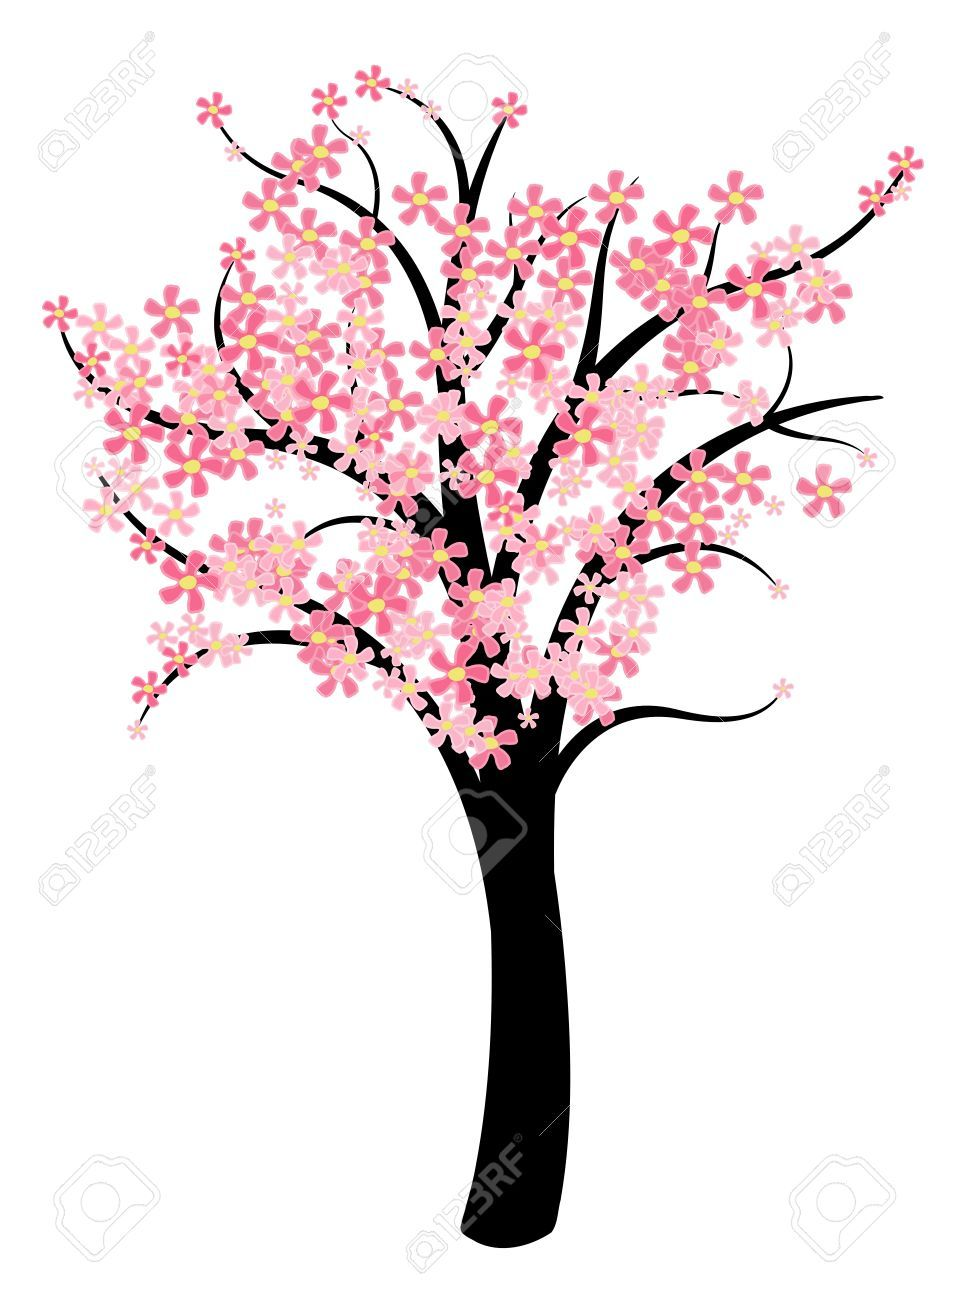 Simple tree vector natural symbol illustration spring cherry illustration of simple tree vector natural symbol illustration vector art clipart and stock vectors biocorpaavc